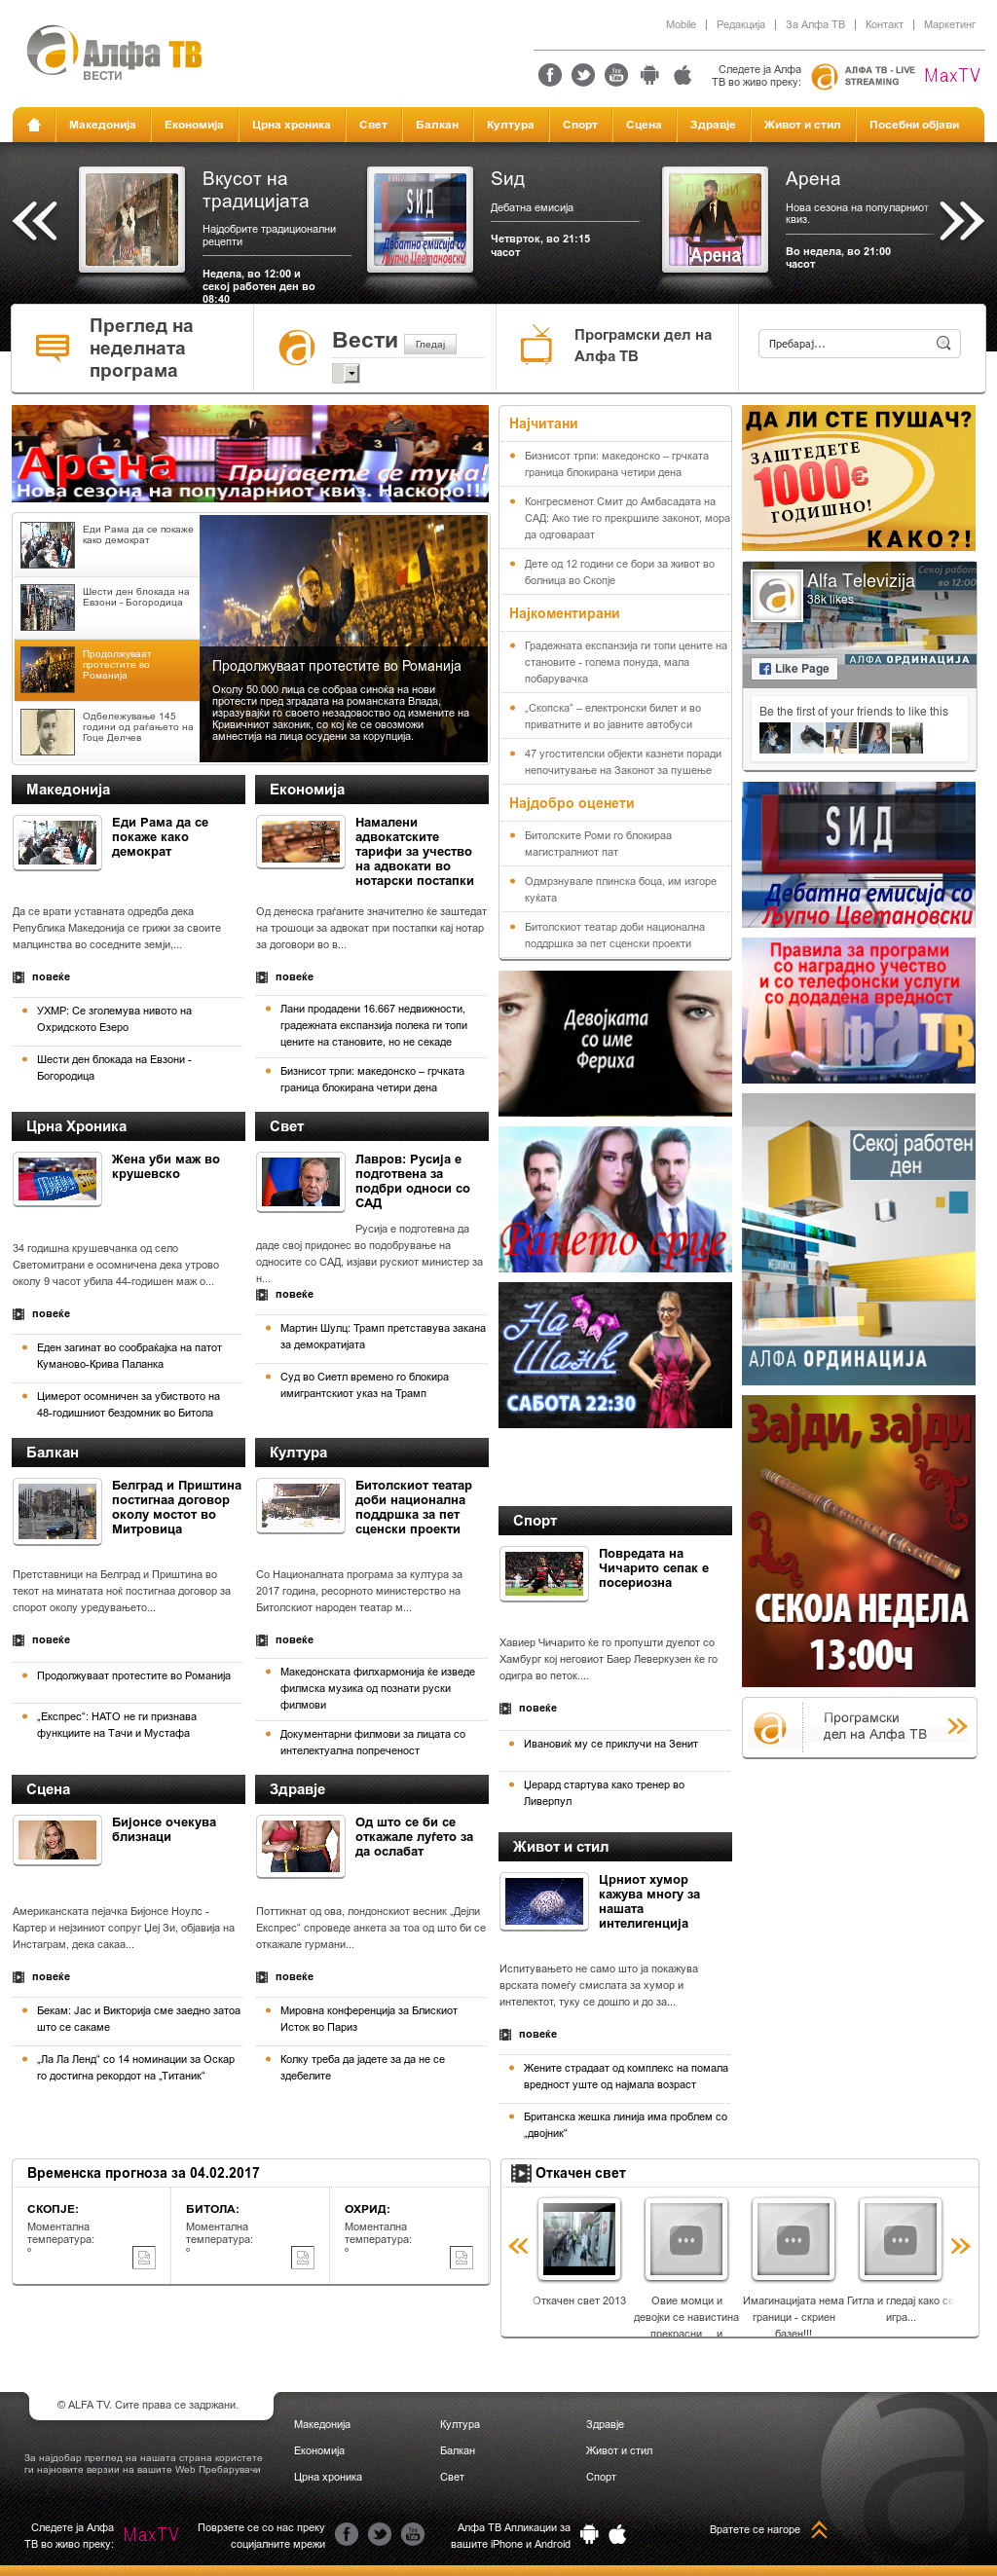 Alfa tv makedonija online dating